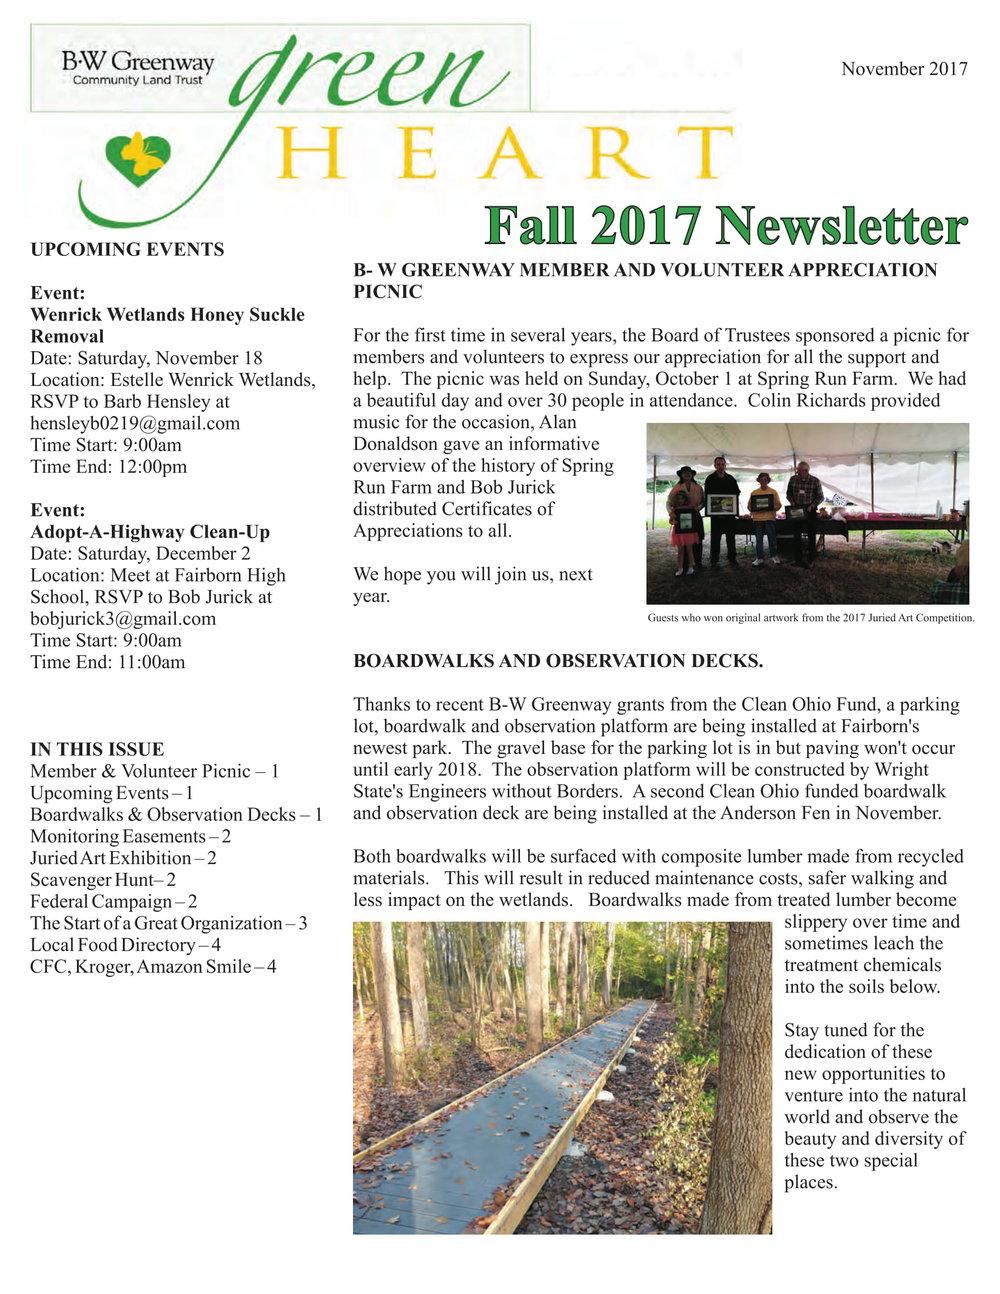 Fall 2017 final-1.jpg